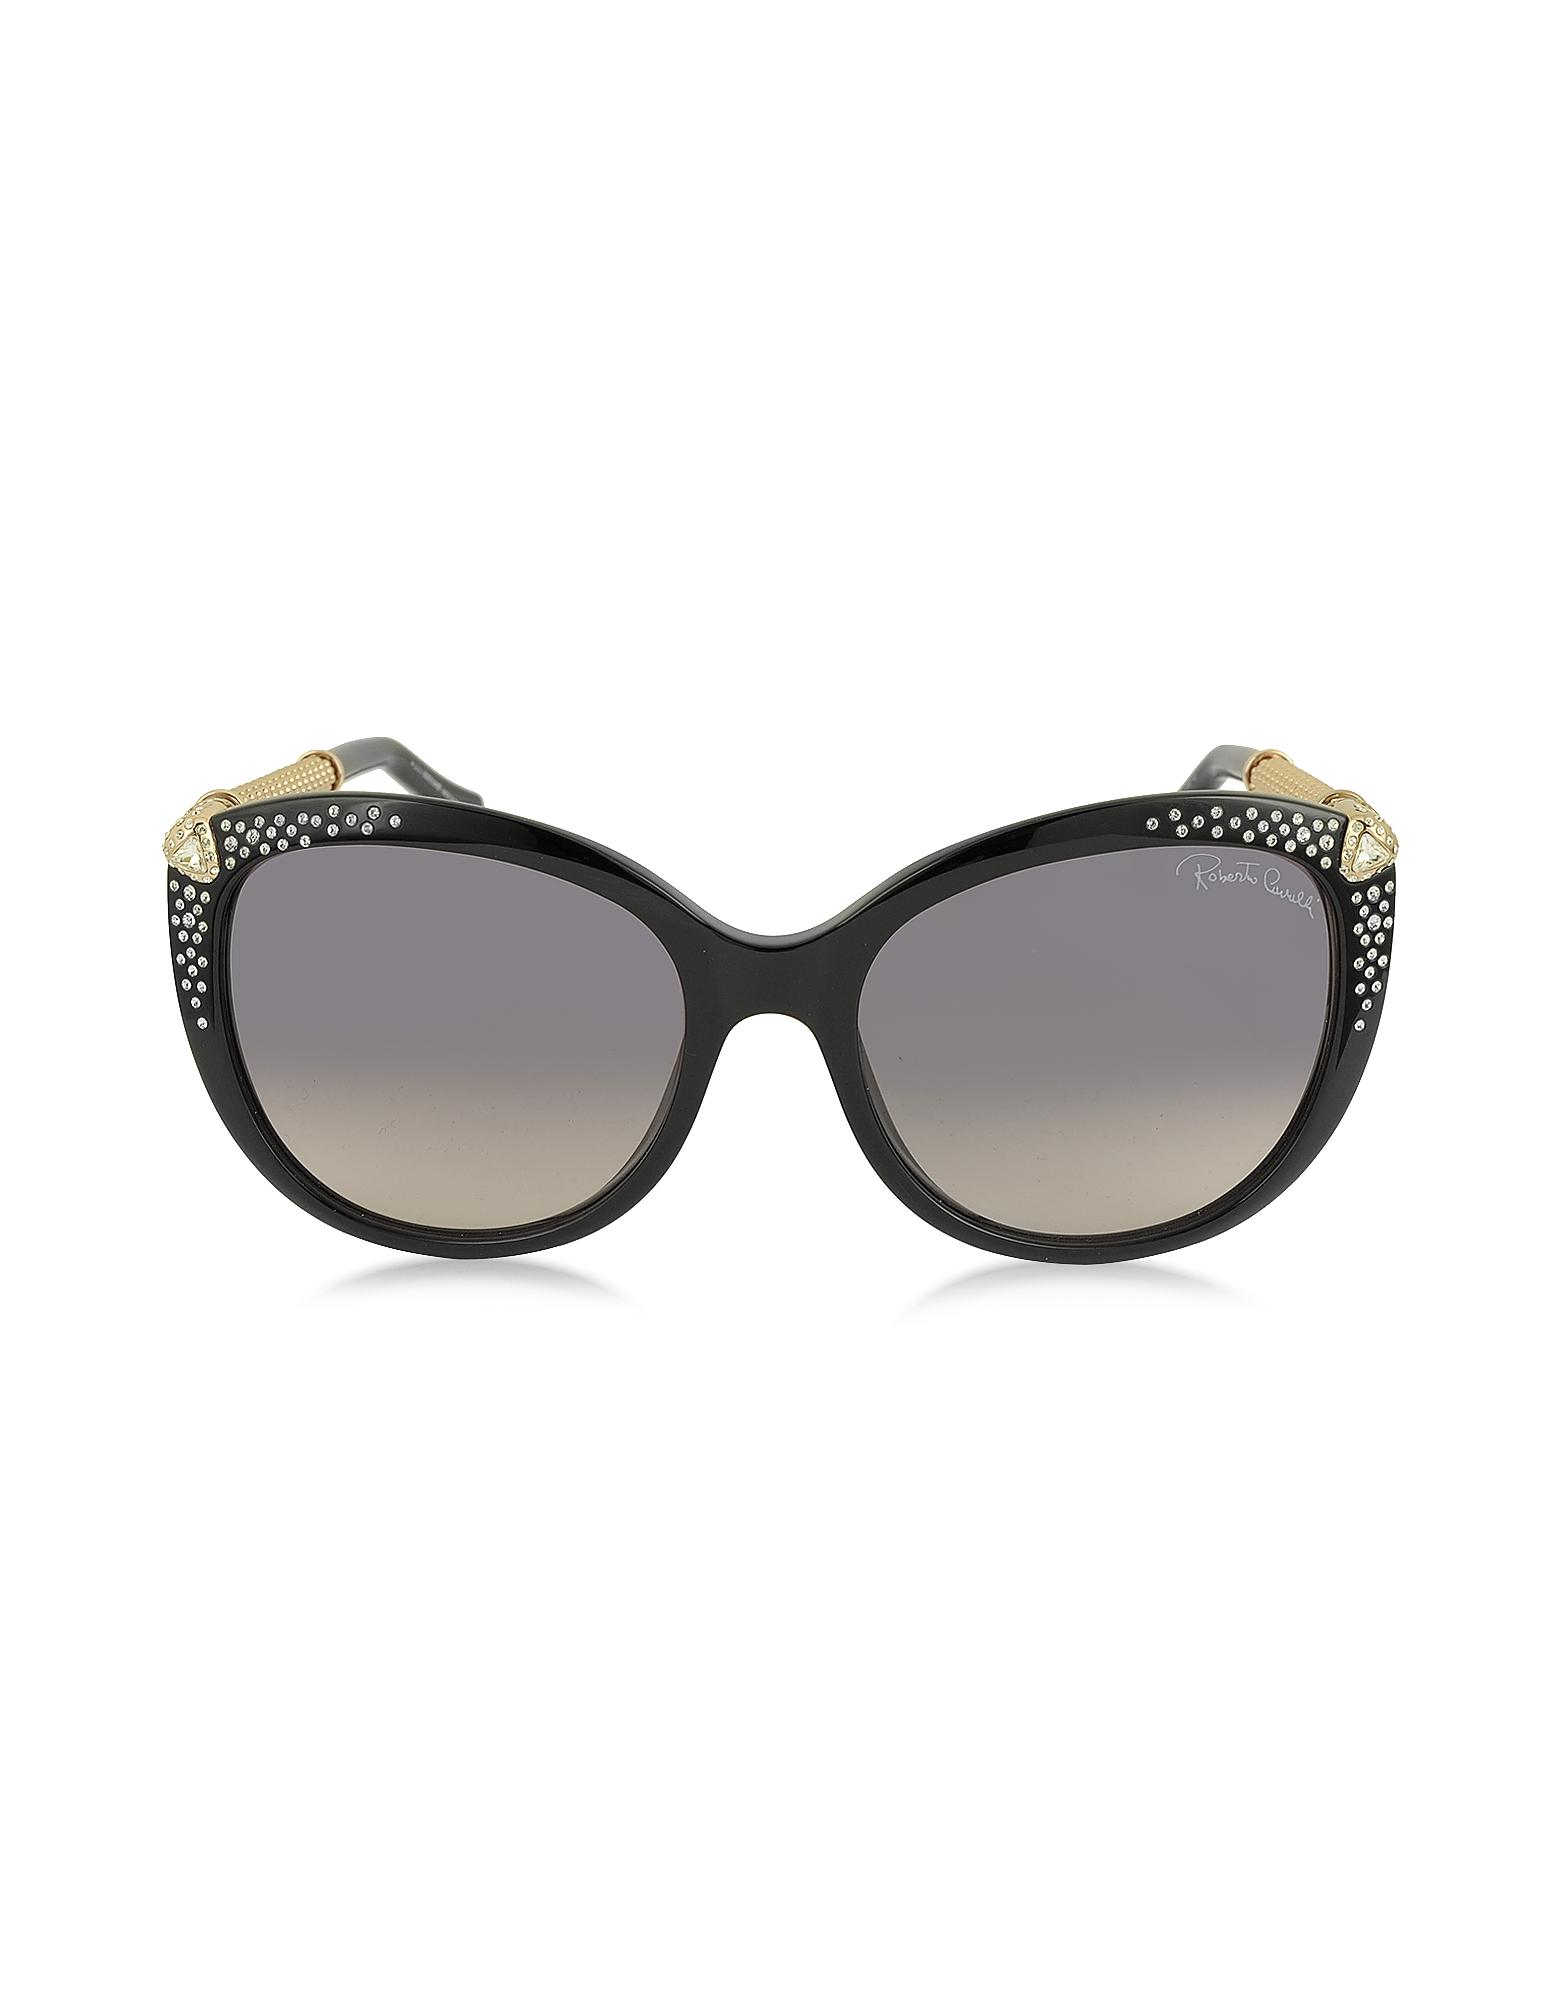 Roberto Cavalli Sunglasses, TANIA 979S Acetate and Crystals Women's Sunglasses